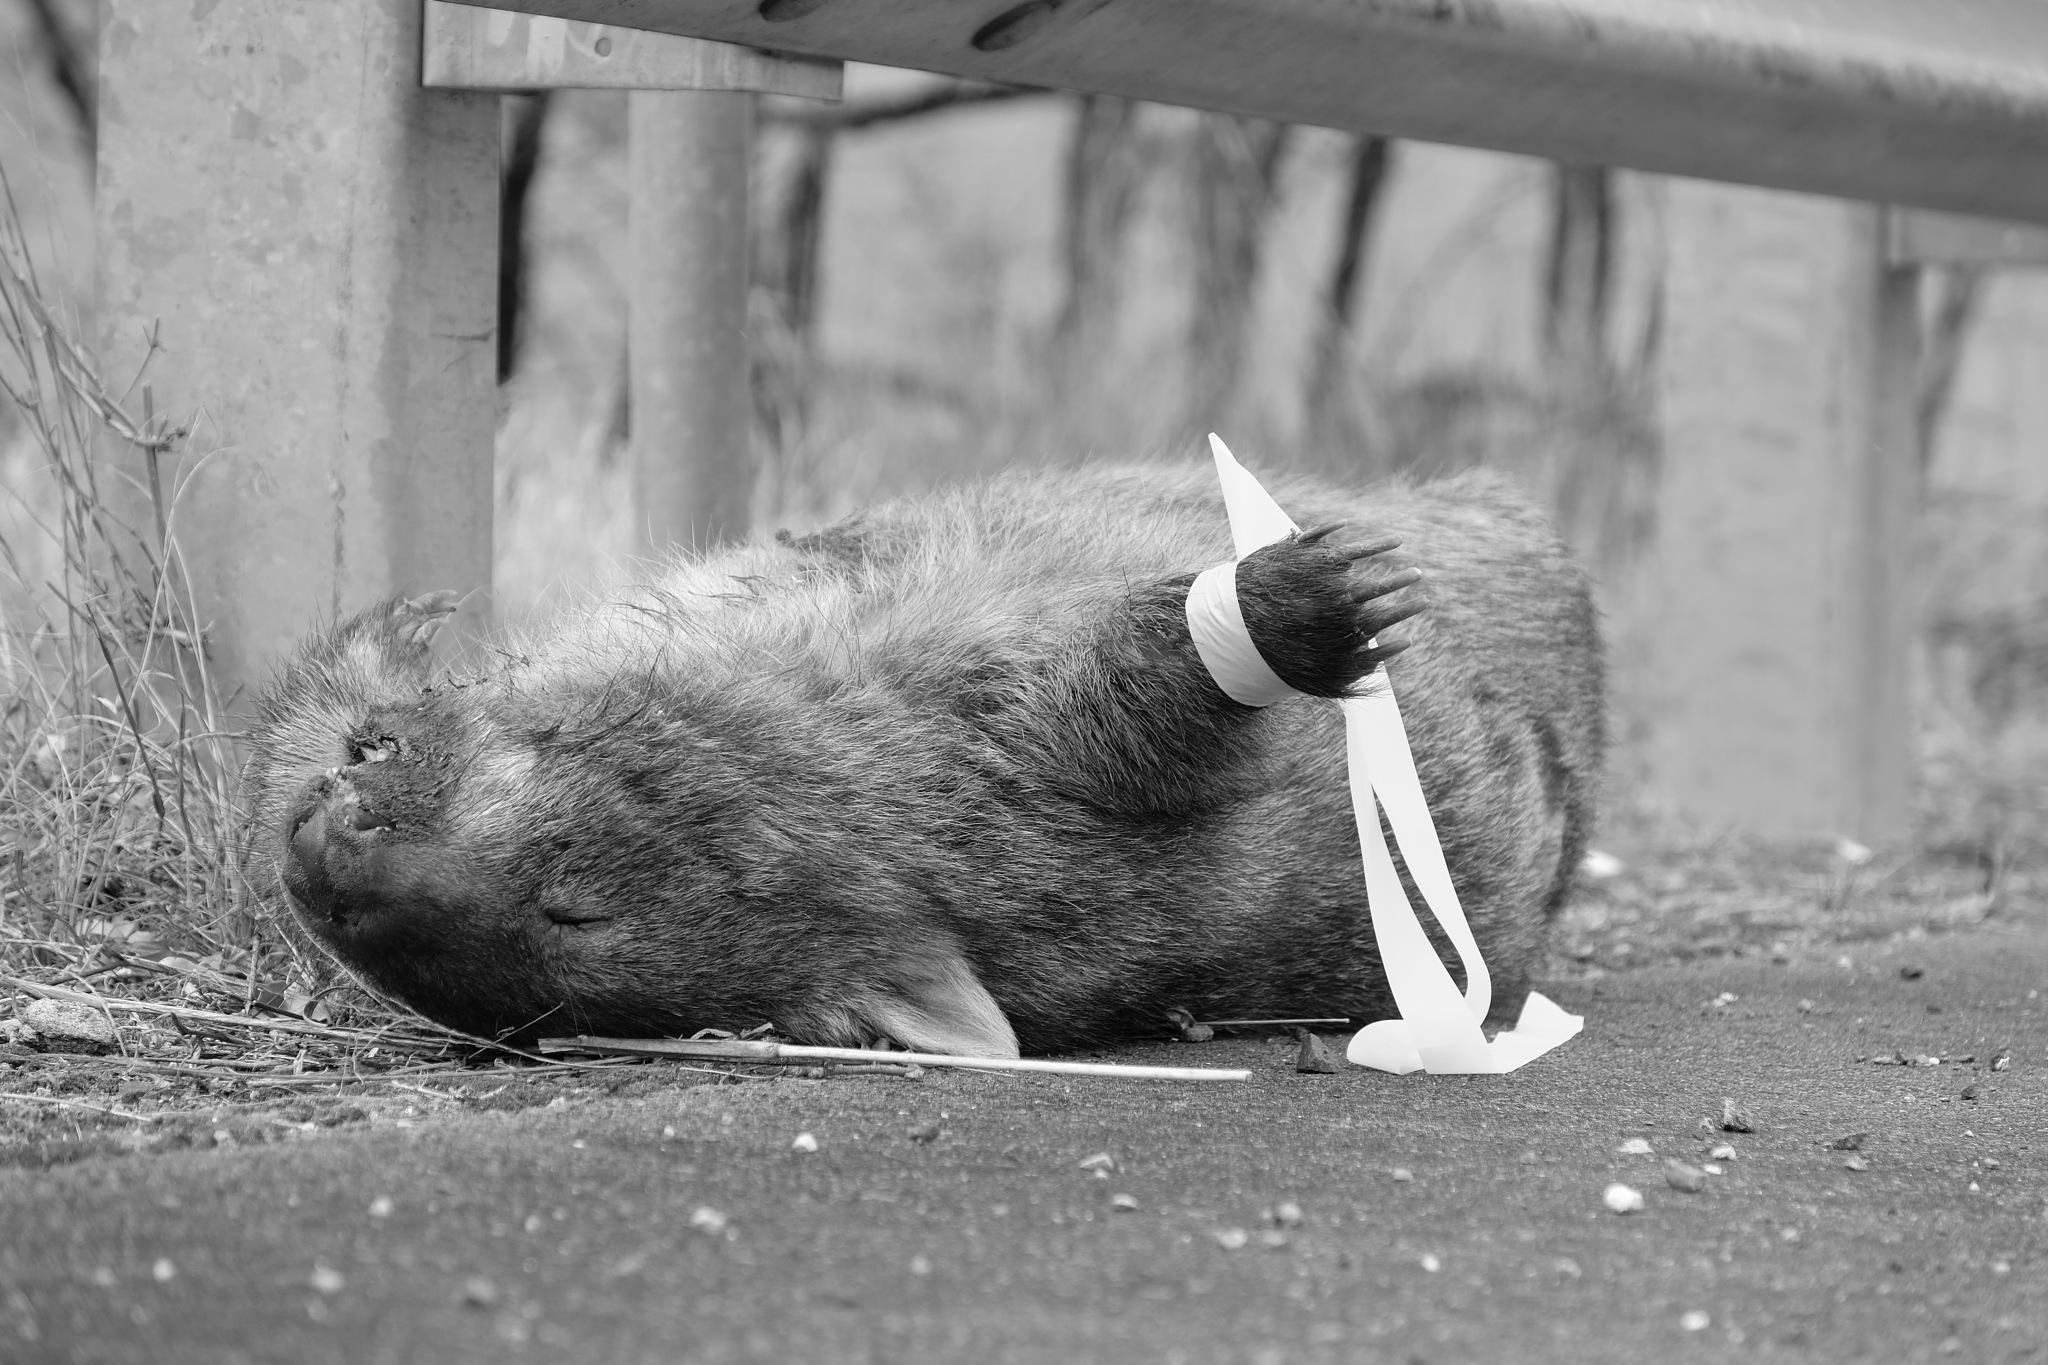 Wombat by JamesFrancis